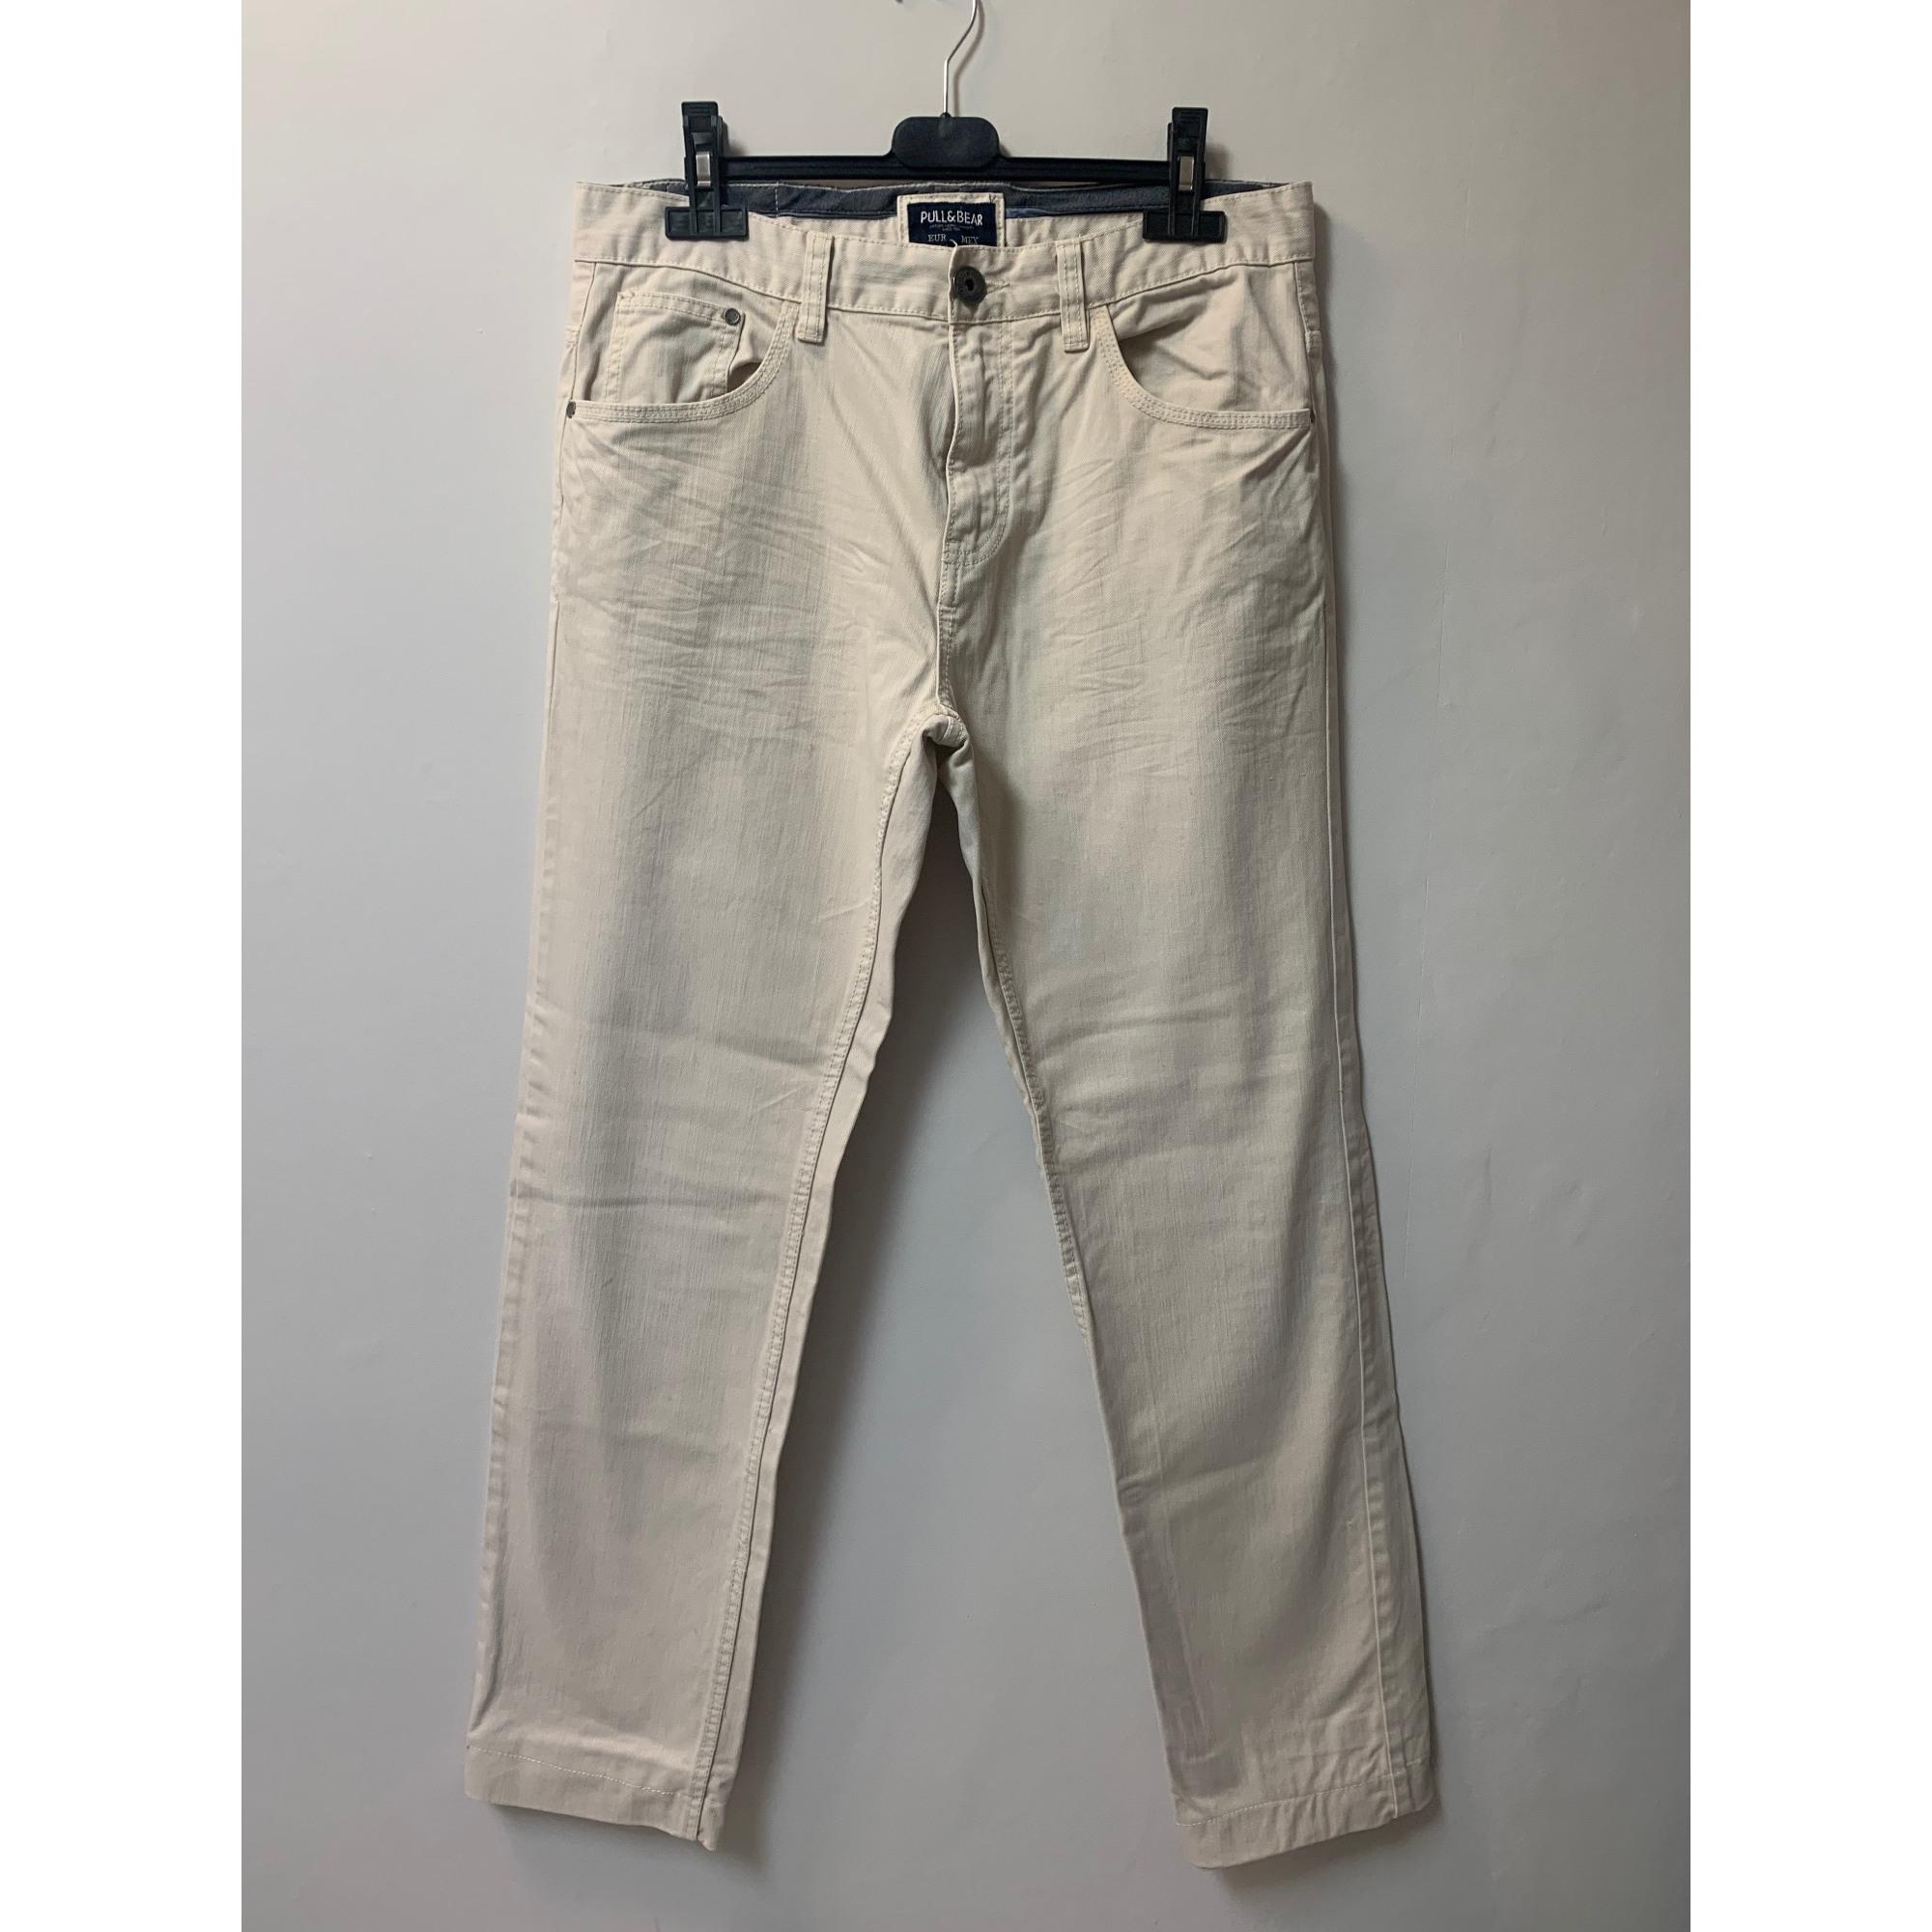 Pantalon droit PULL & BEAR Beige, camel